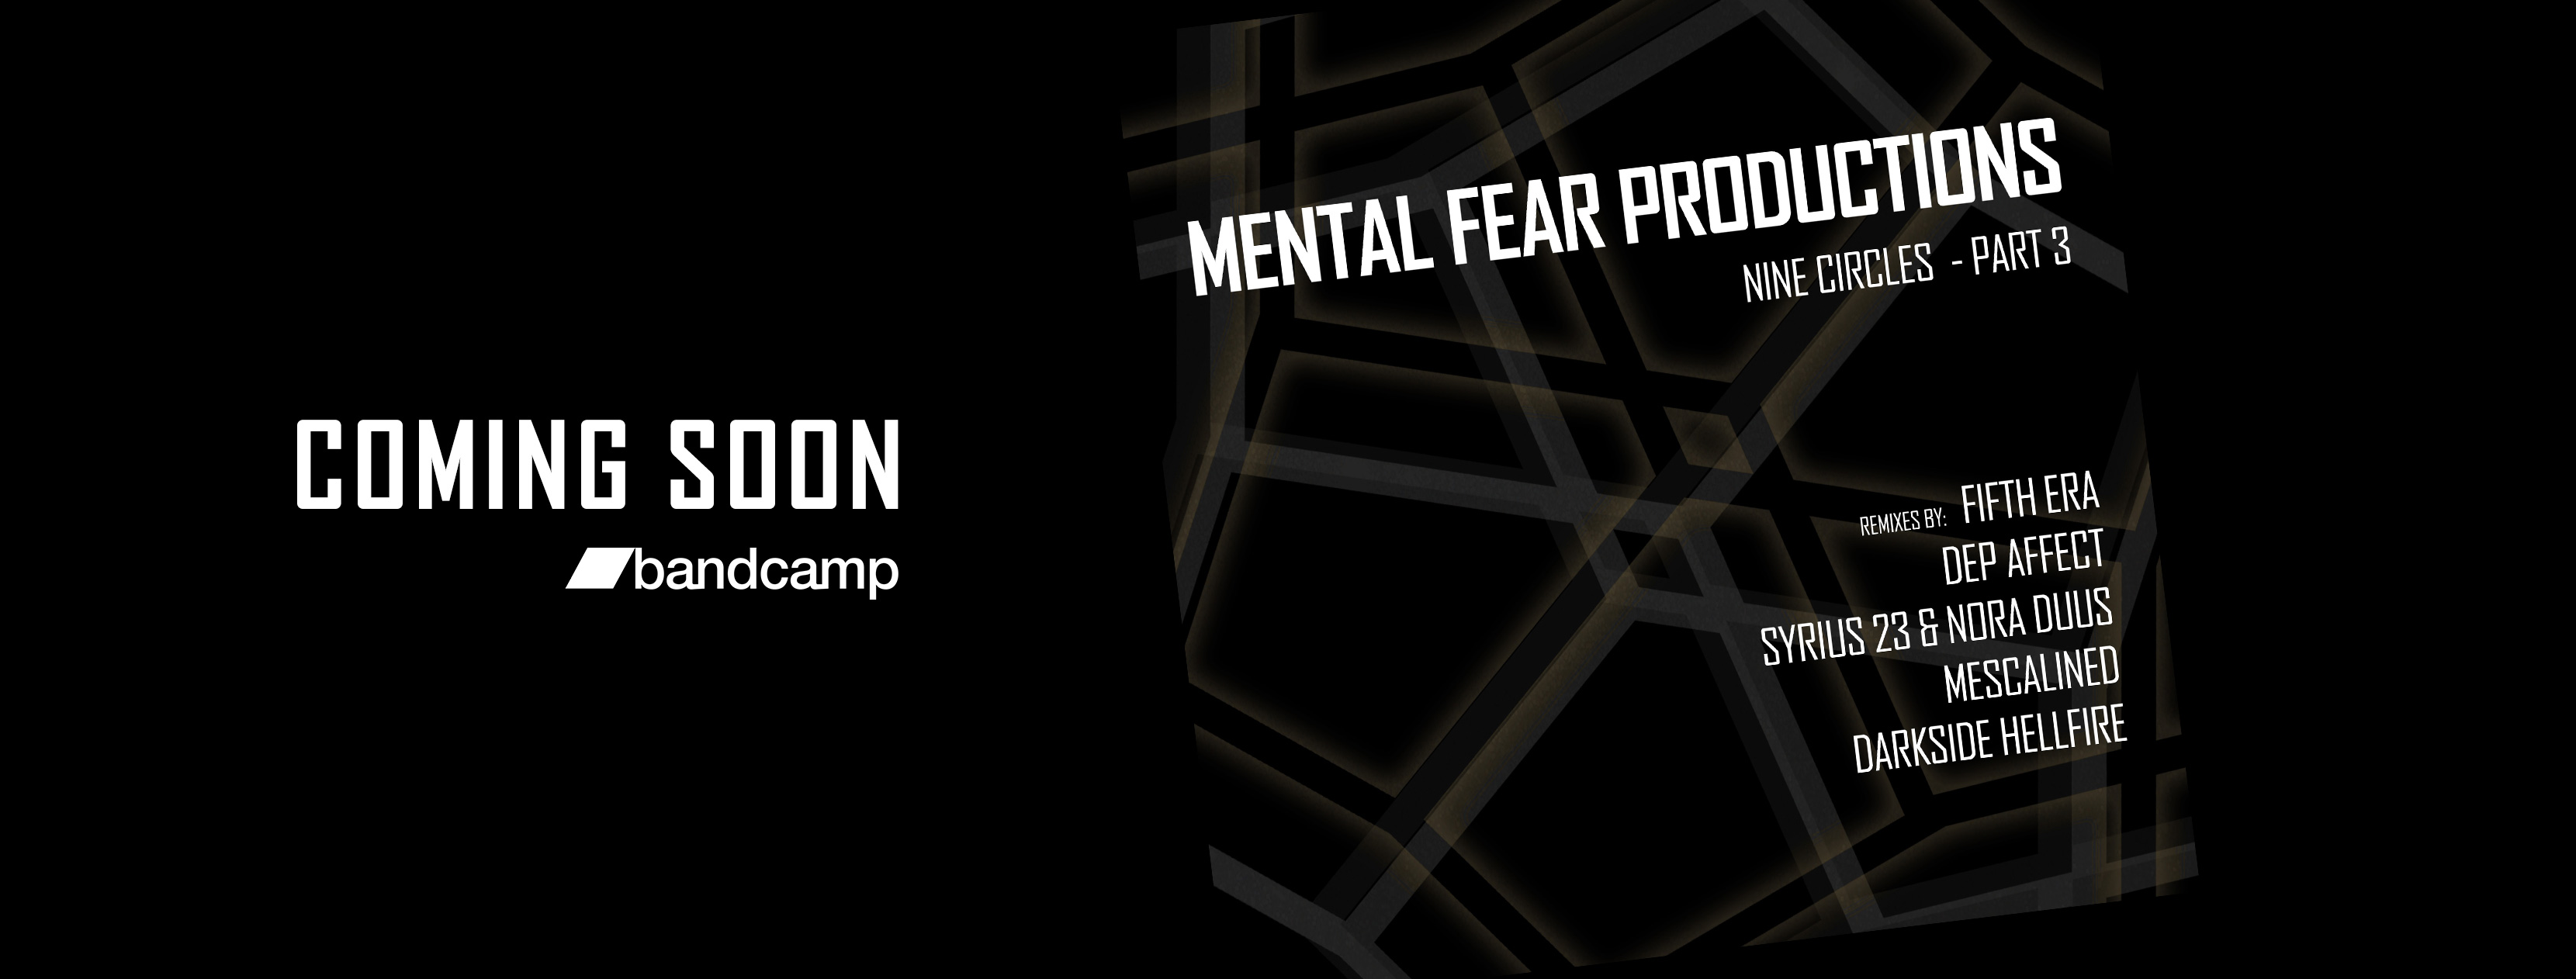 Mental Fear Productions - Nine Circles Part 3